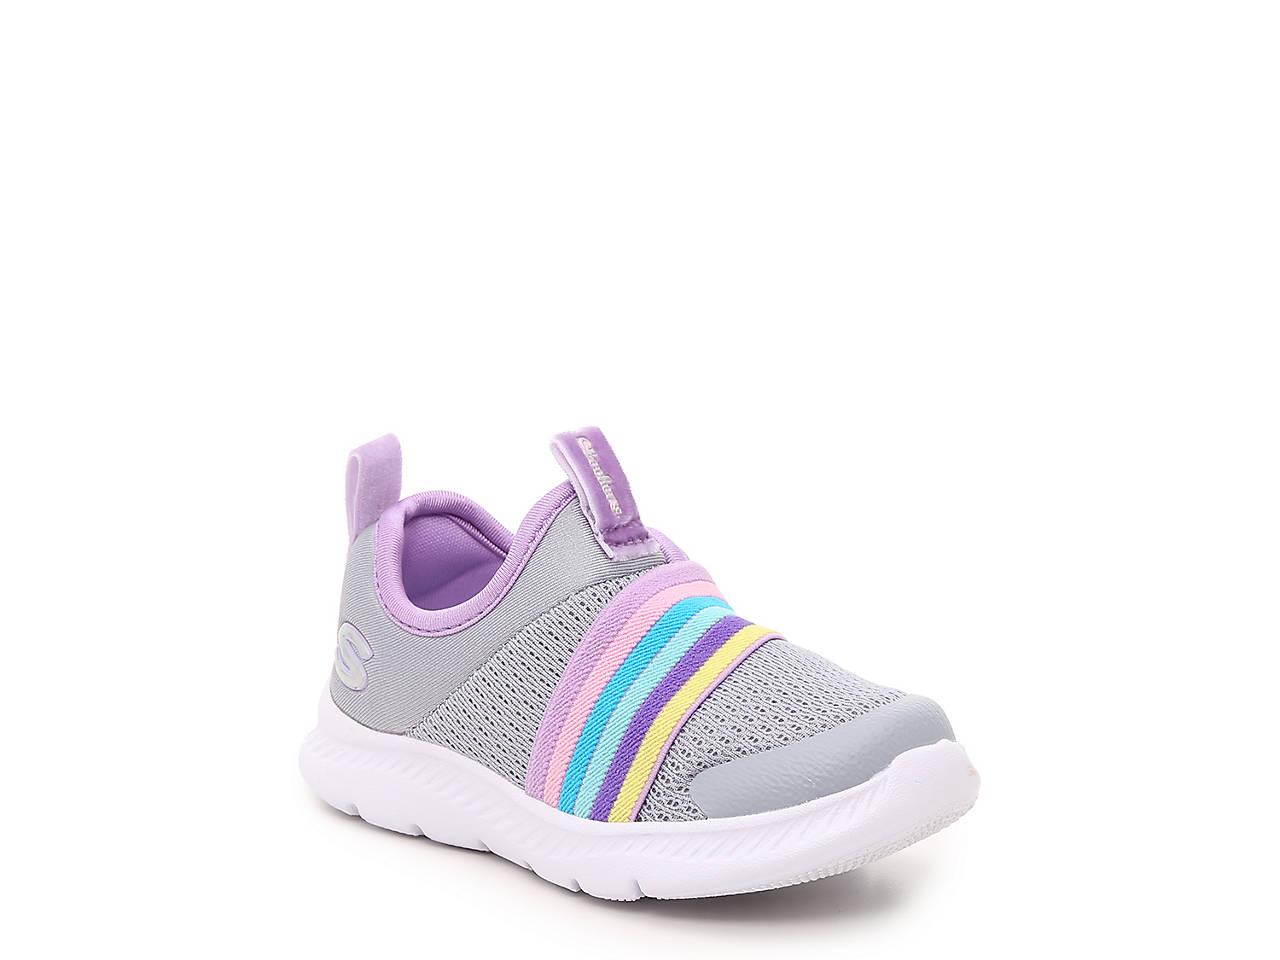 Skechers Comfy Flex 2.0 Rainbow Delight Slip On Sneaker